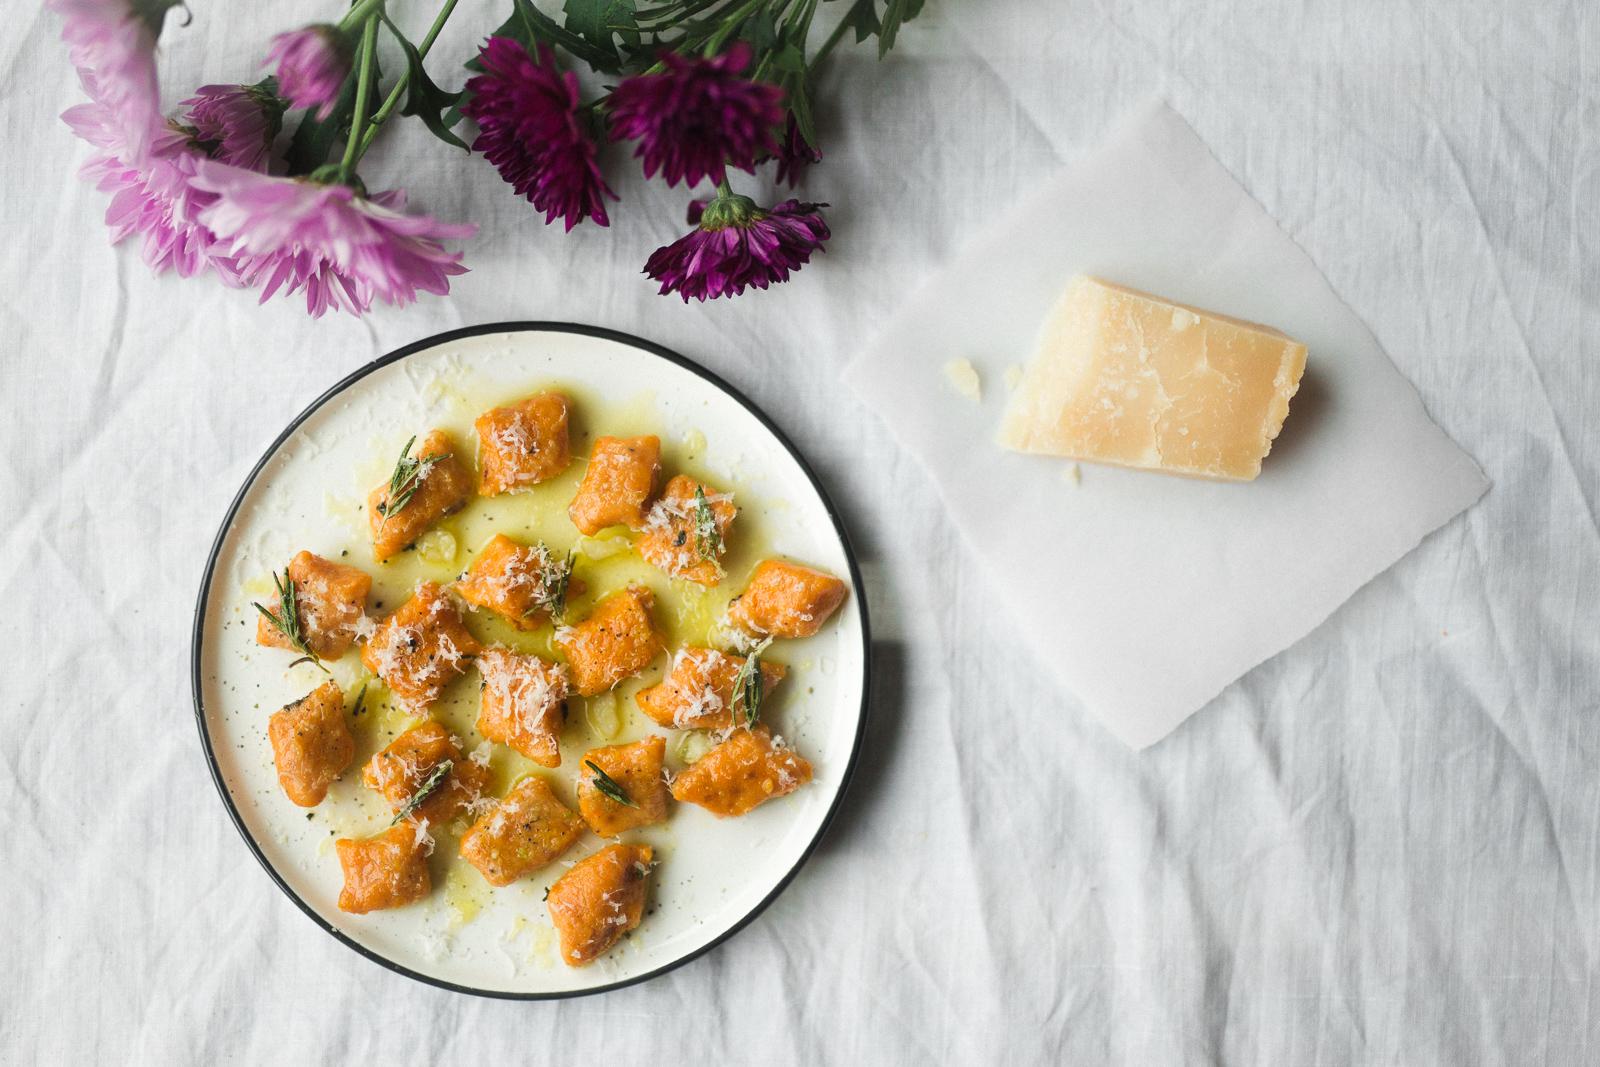 Sweet potato gnocchi, olive oil, rosemary, garlic, pecorino.